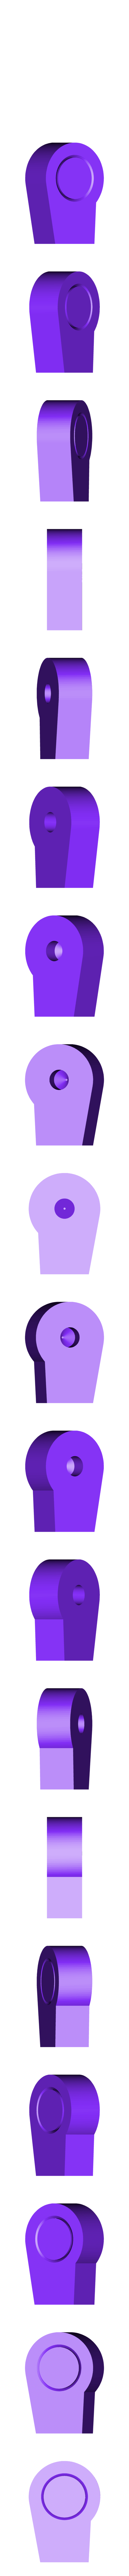 Leg-Right.STL Download STL file Grimlock • Model to 3D print, biglildesign